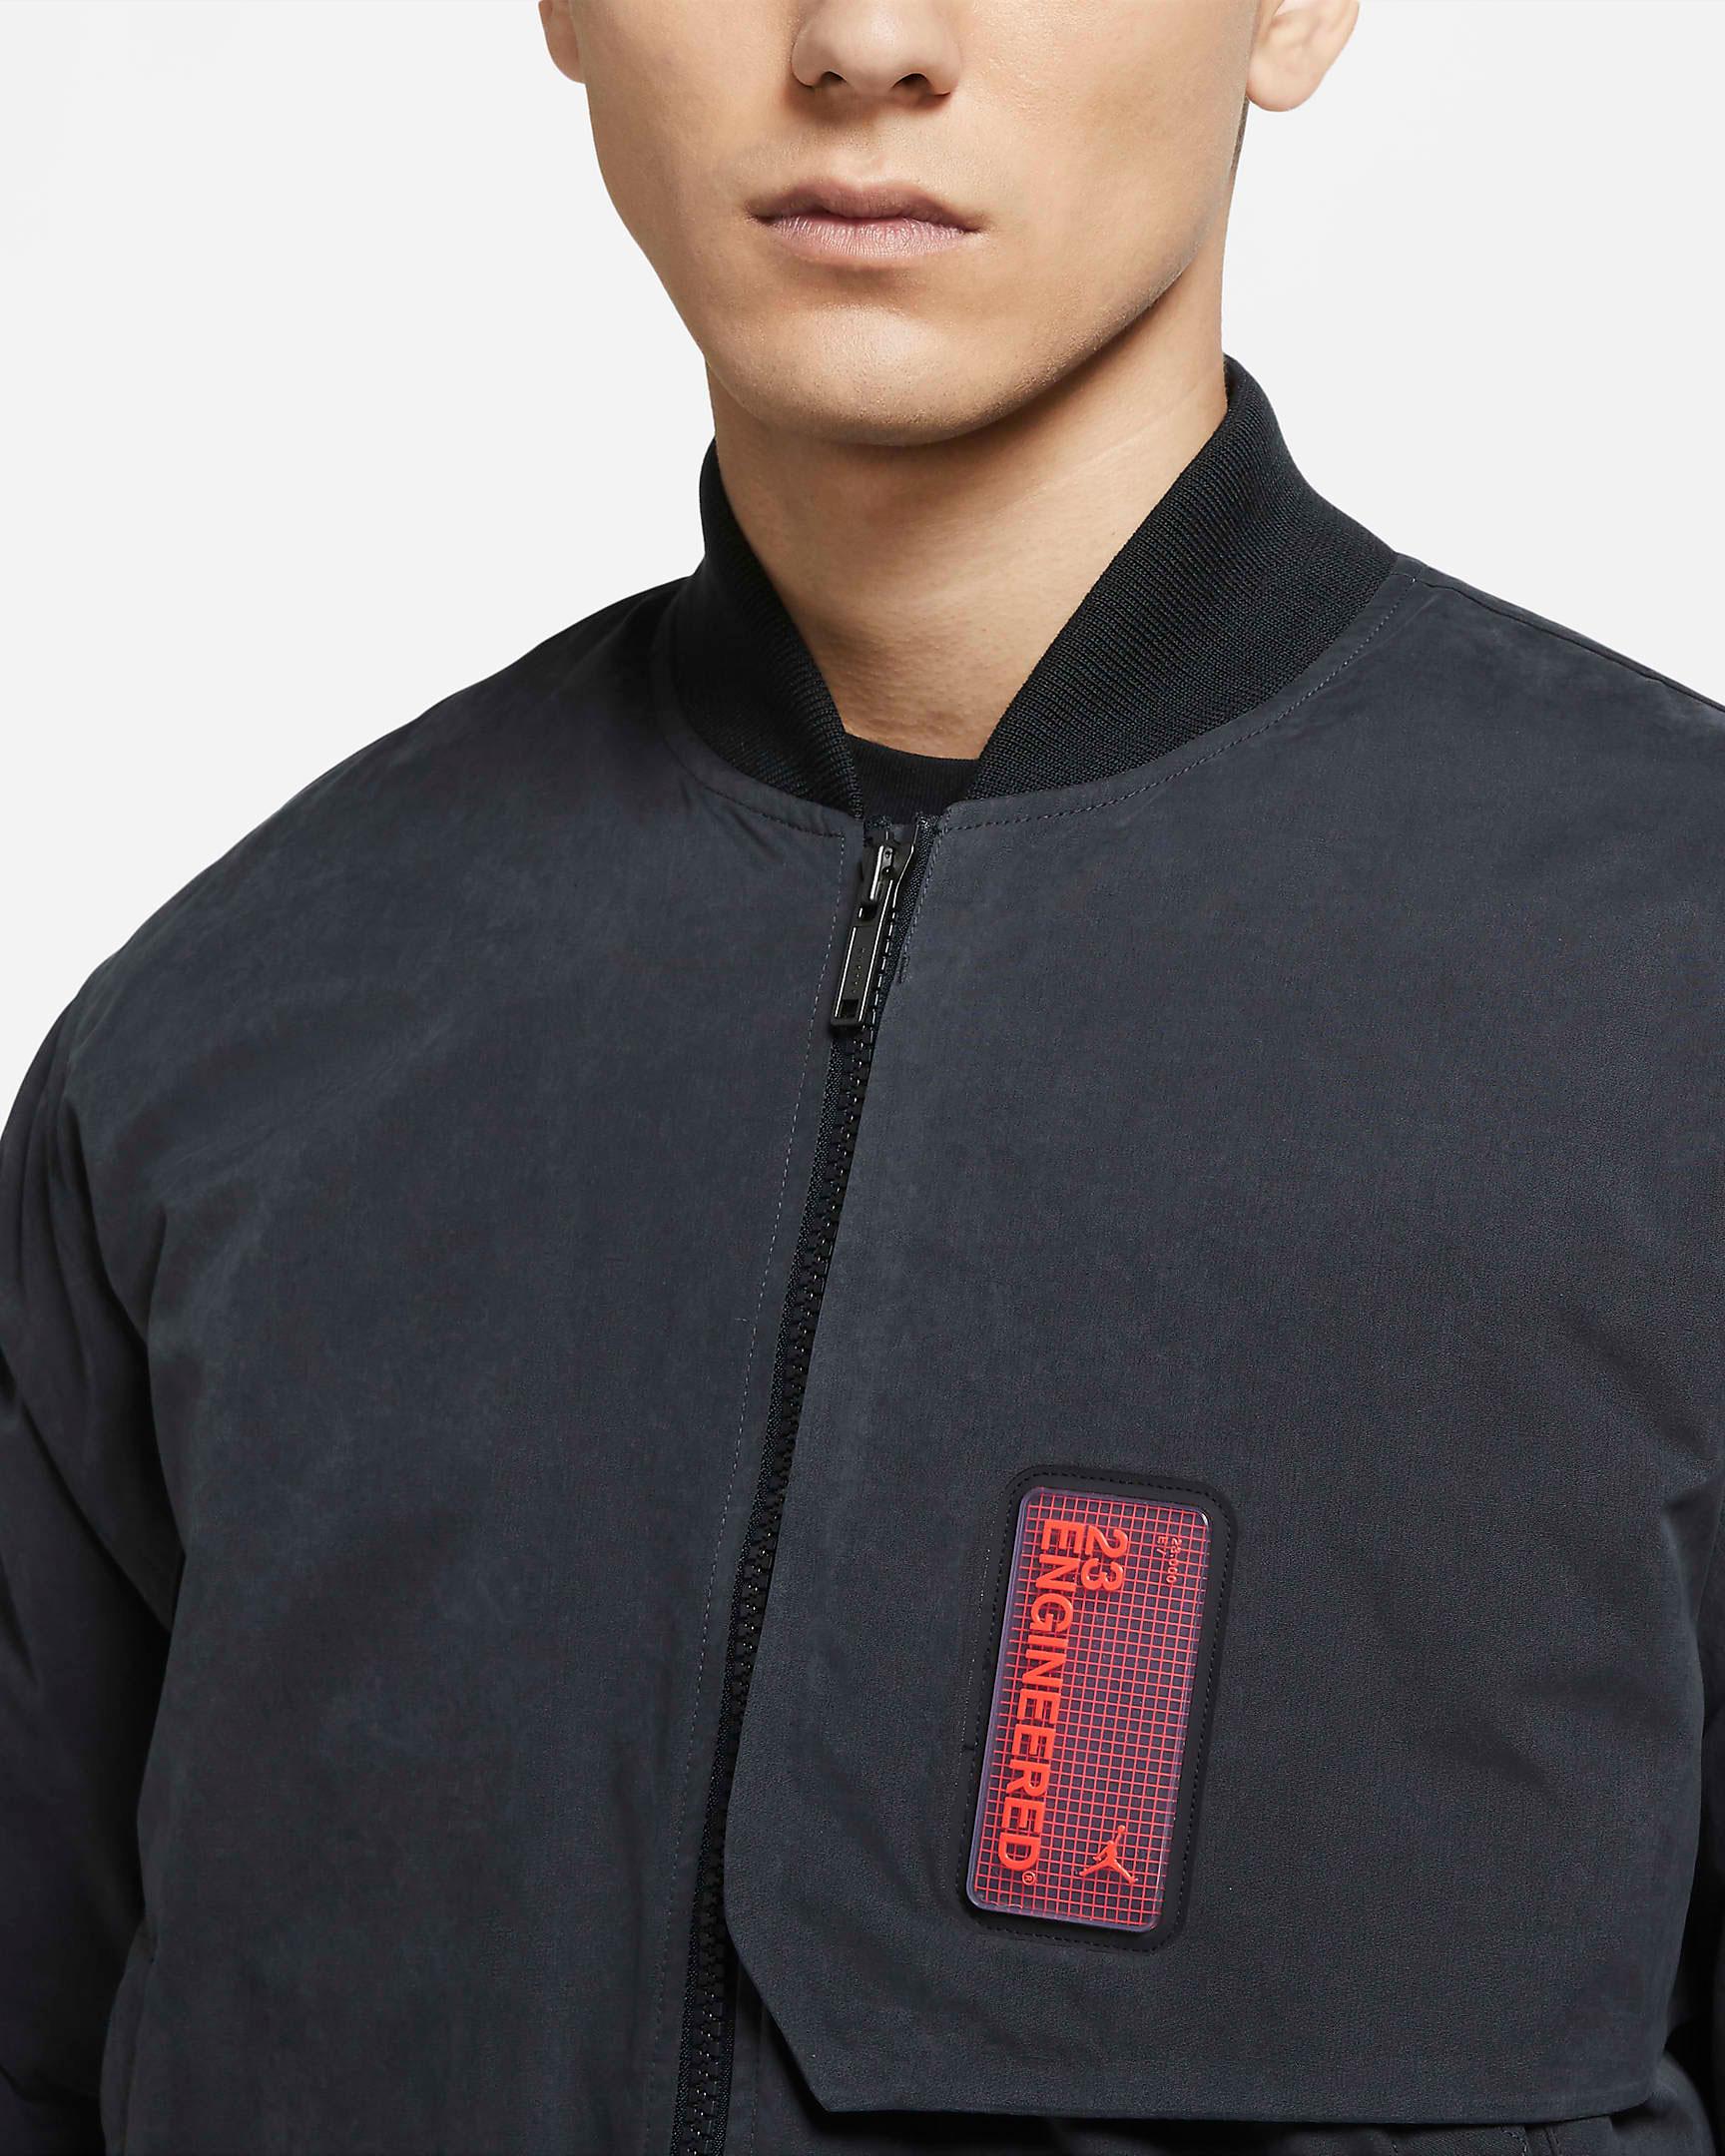 air-jordan-11-adapt-jacket-match-3